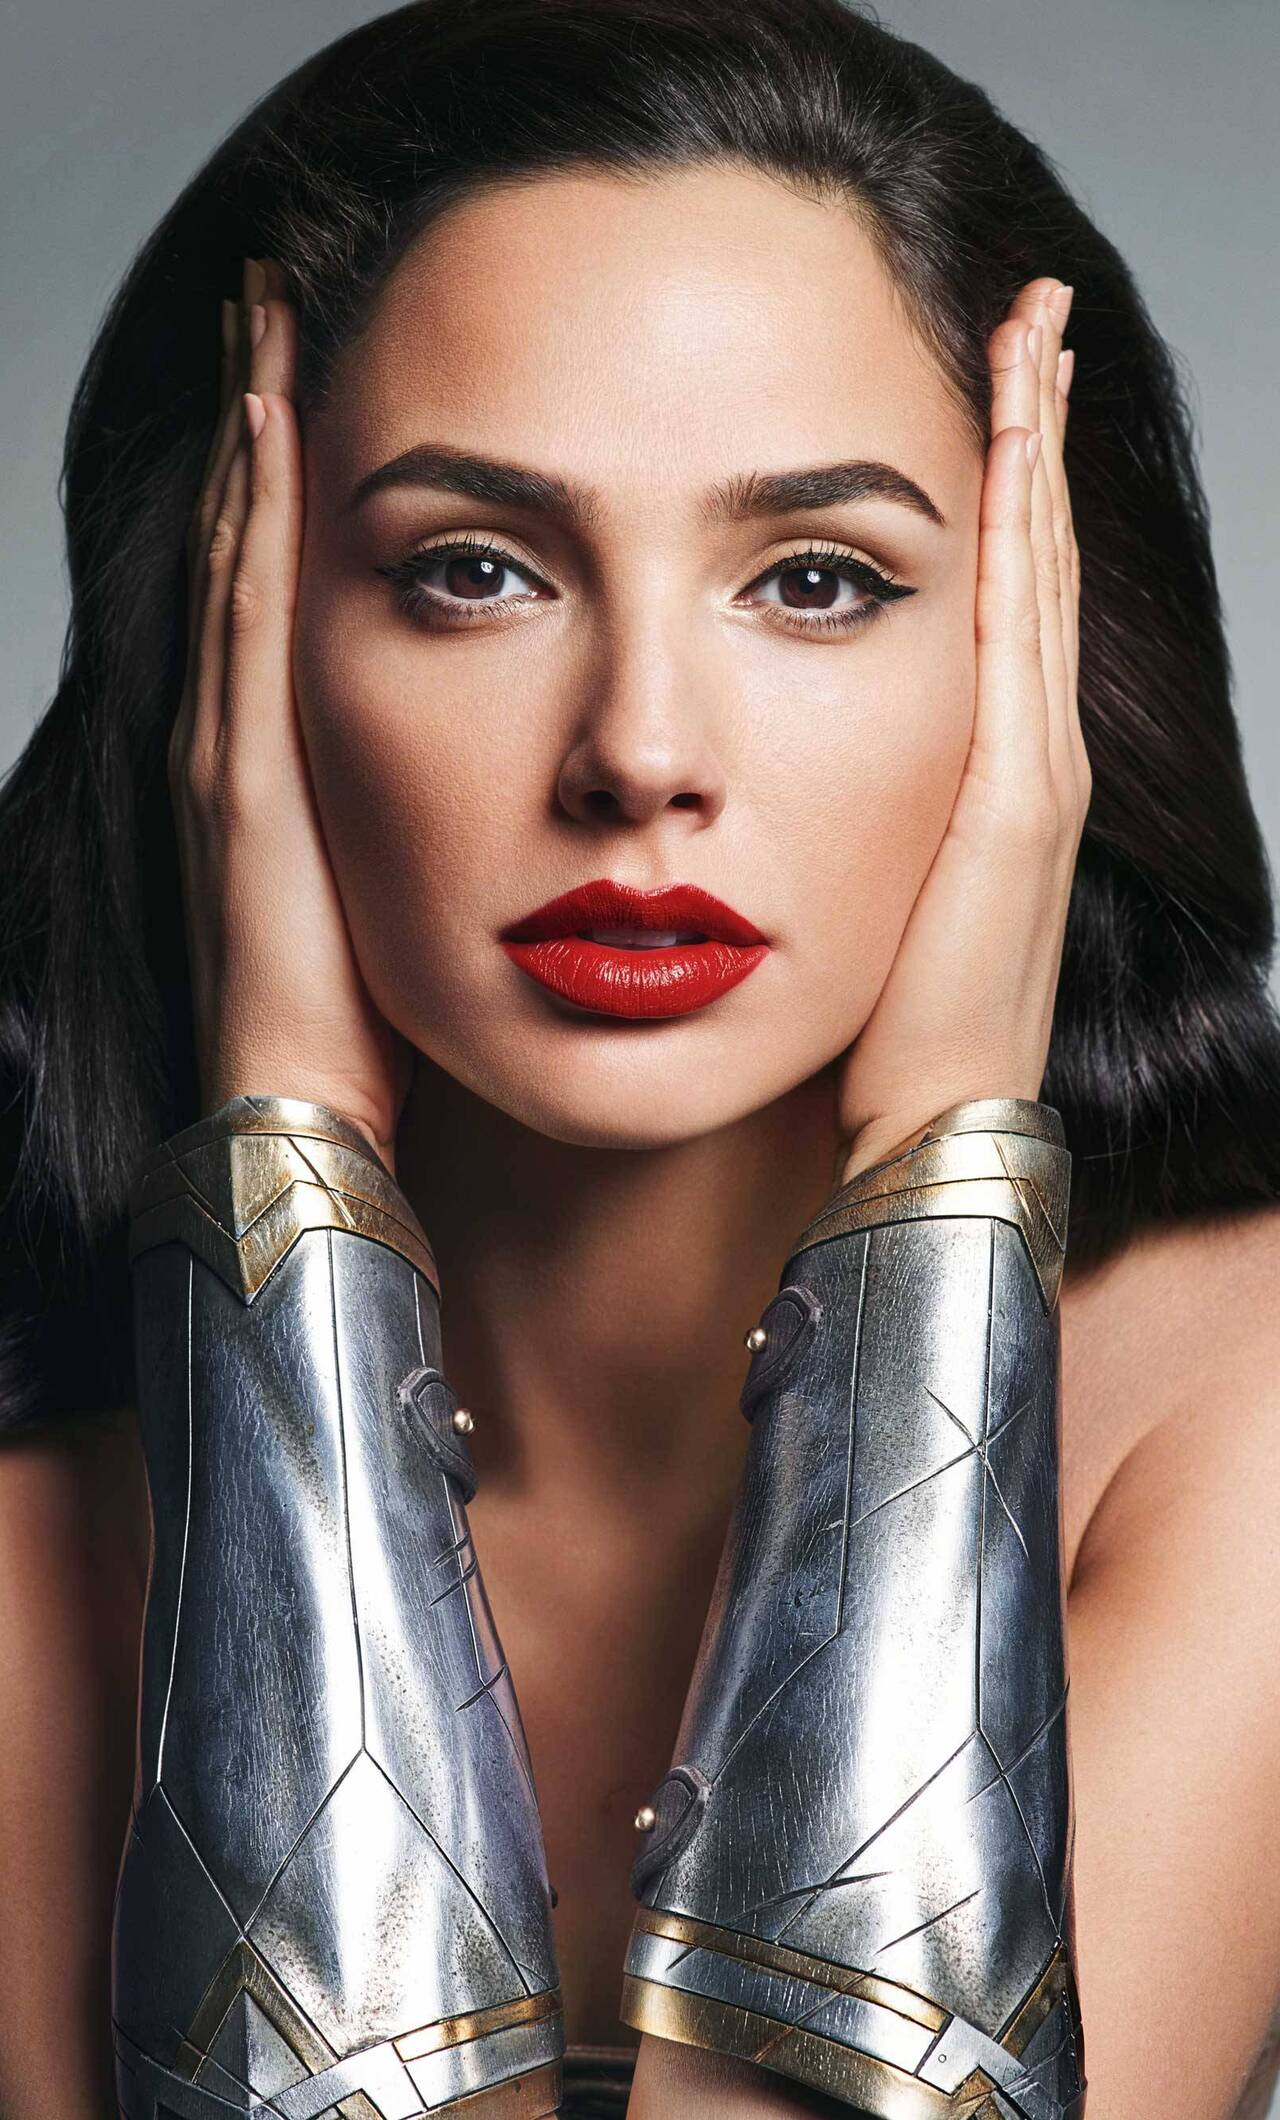 1280x2120 Gal Gadot As Wonder Woman New Iphone 6 Hd 4k Wallpapers